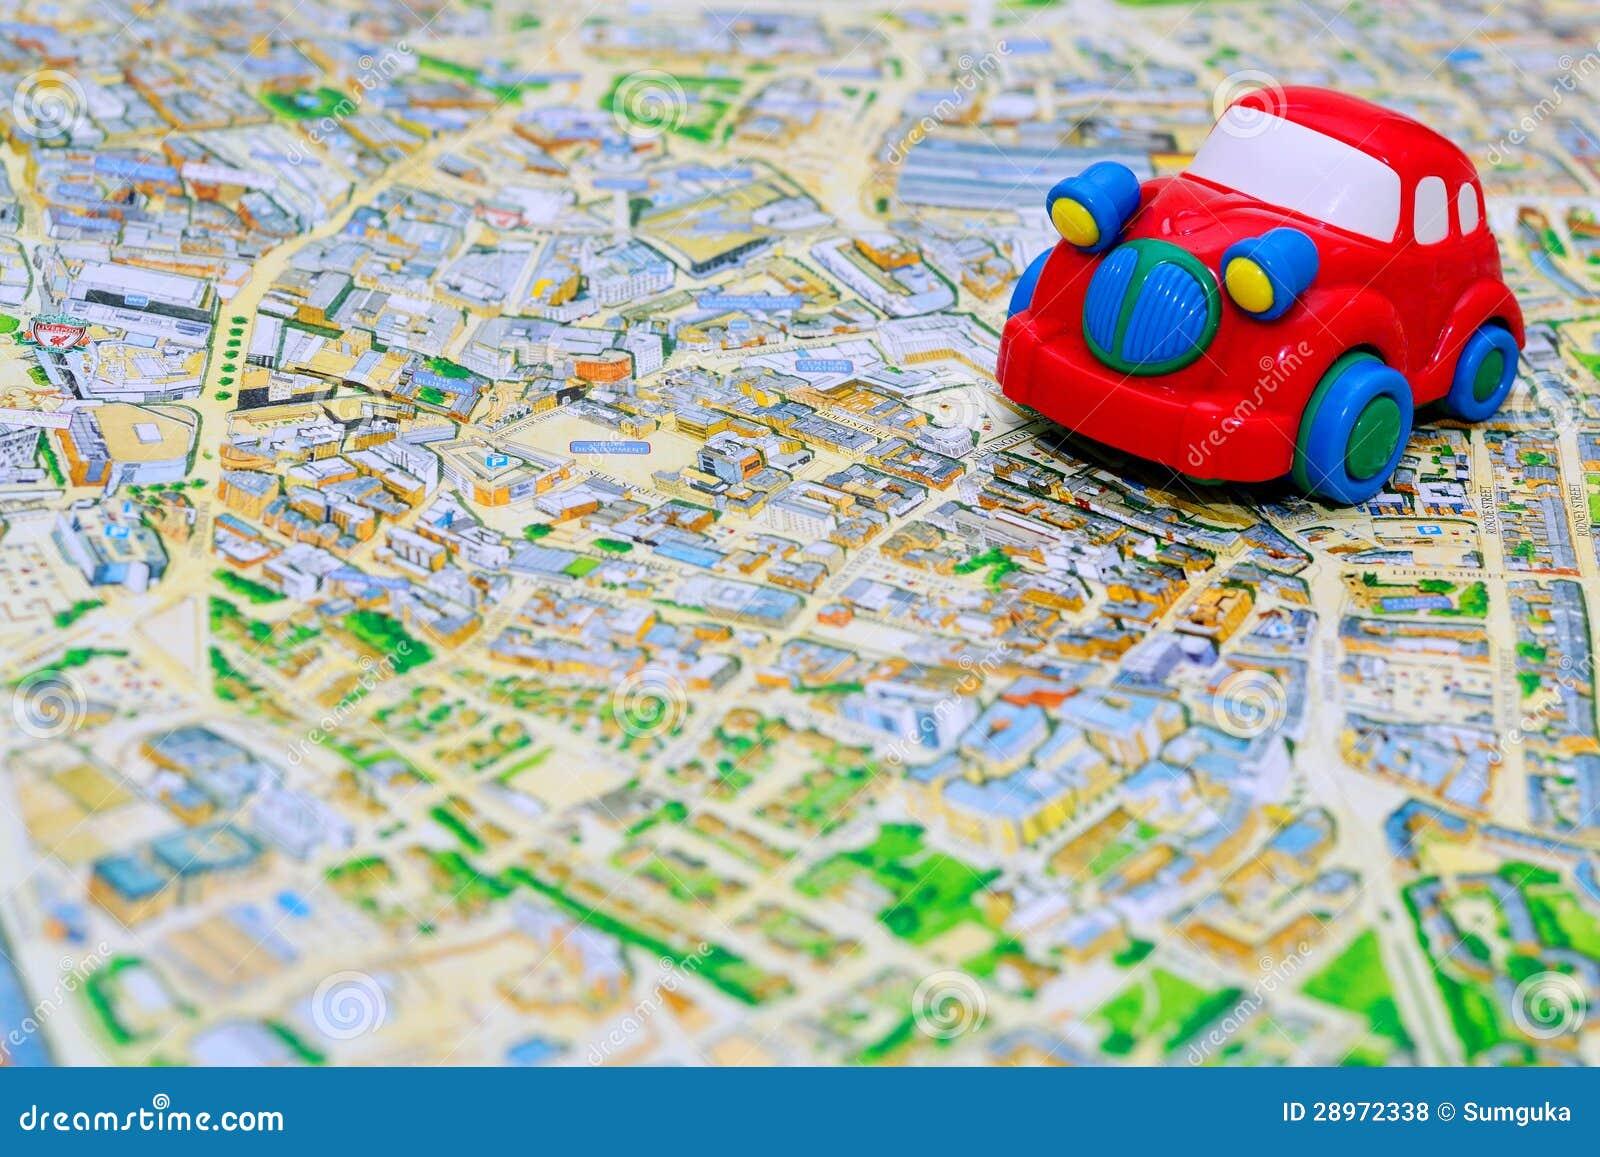 Rewolucjonistka zabawkarski samochód na mapie